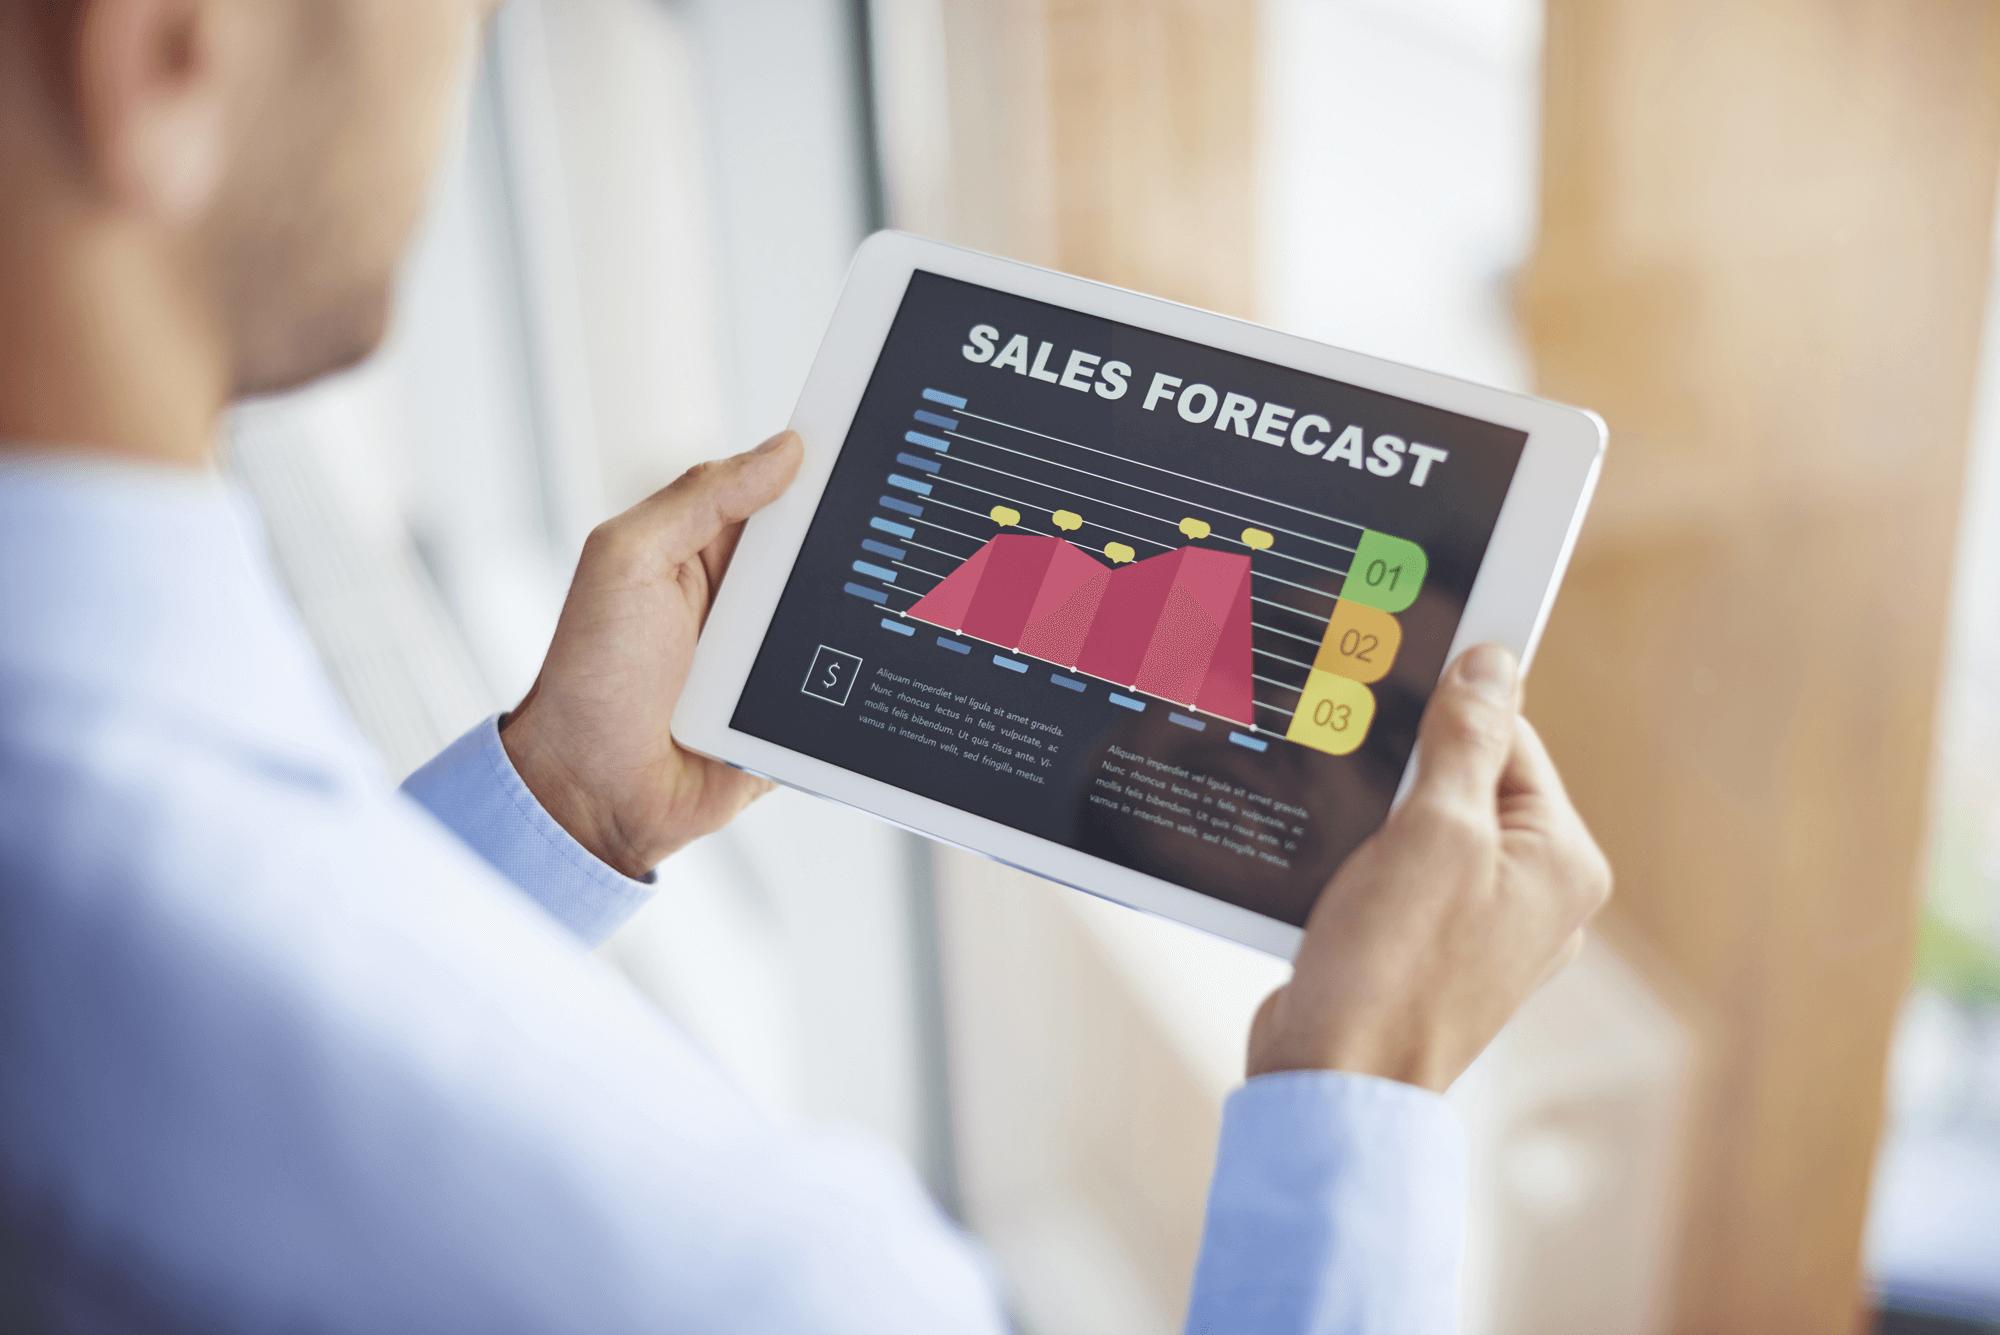 Telecombedrijf   Business Intelligence & Dashboards   Klantfocus